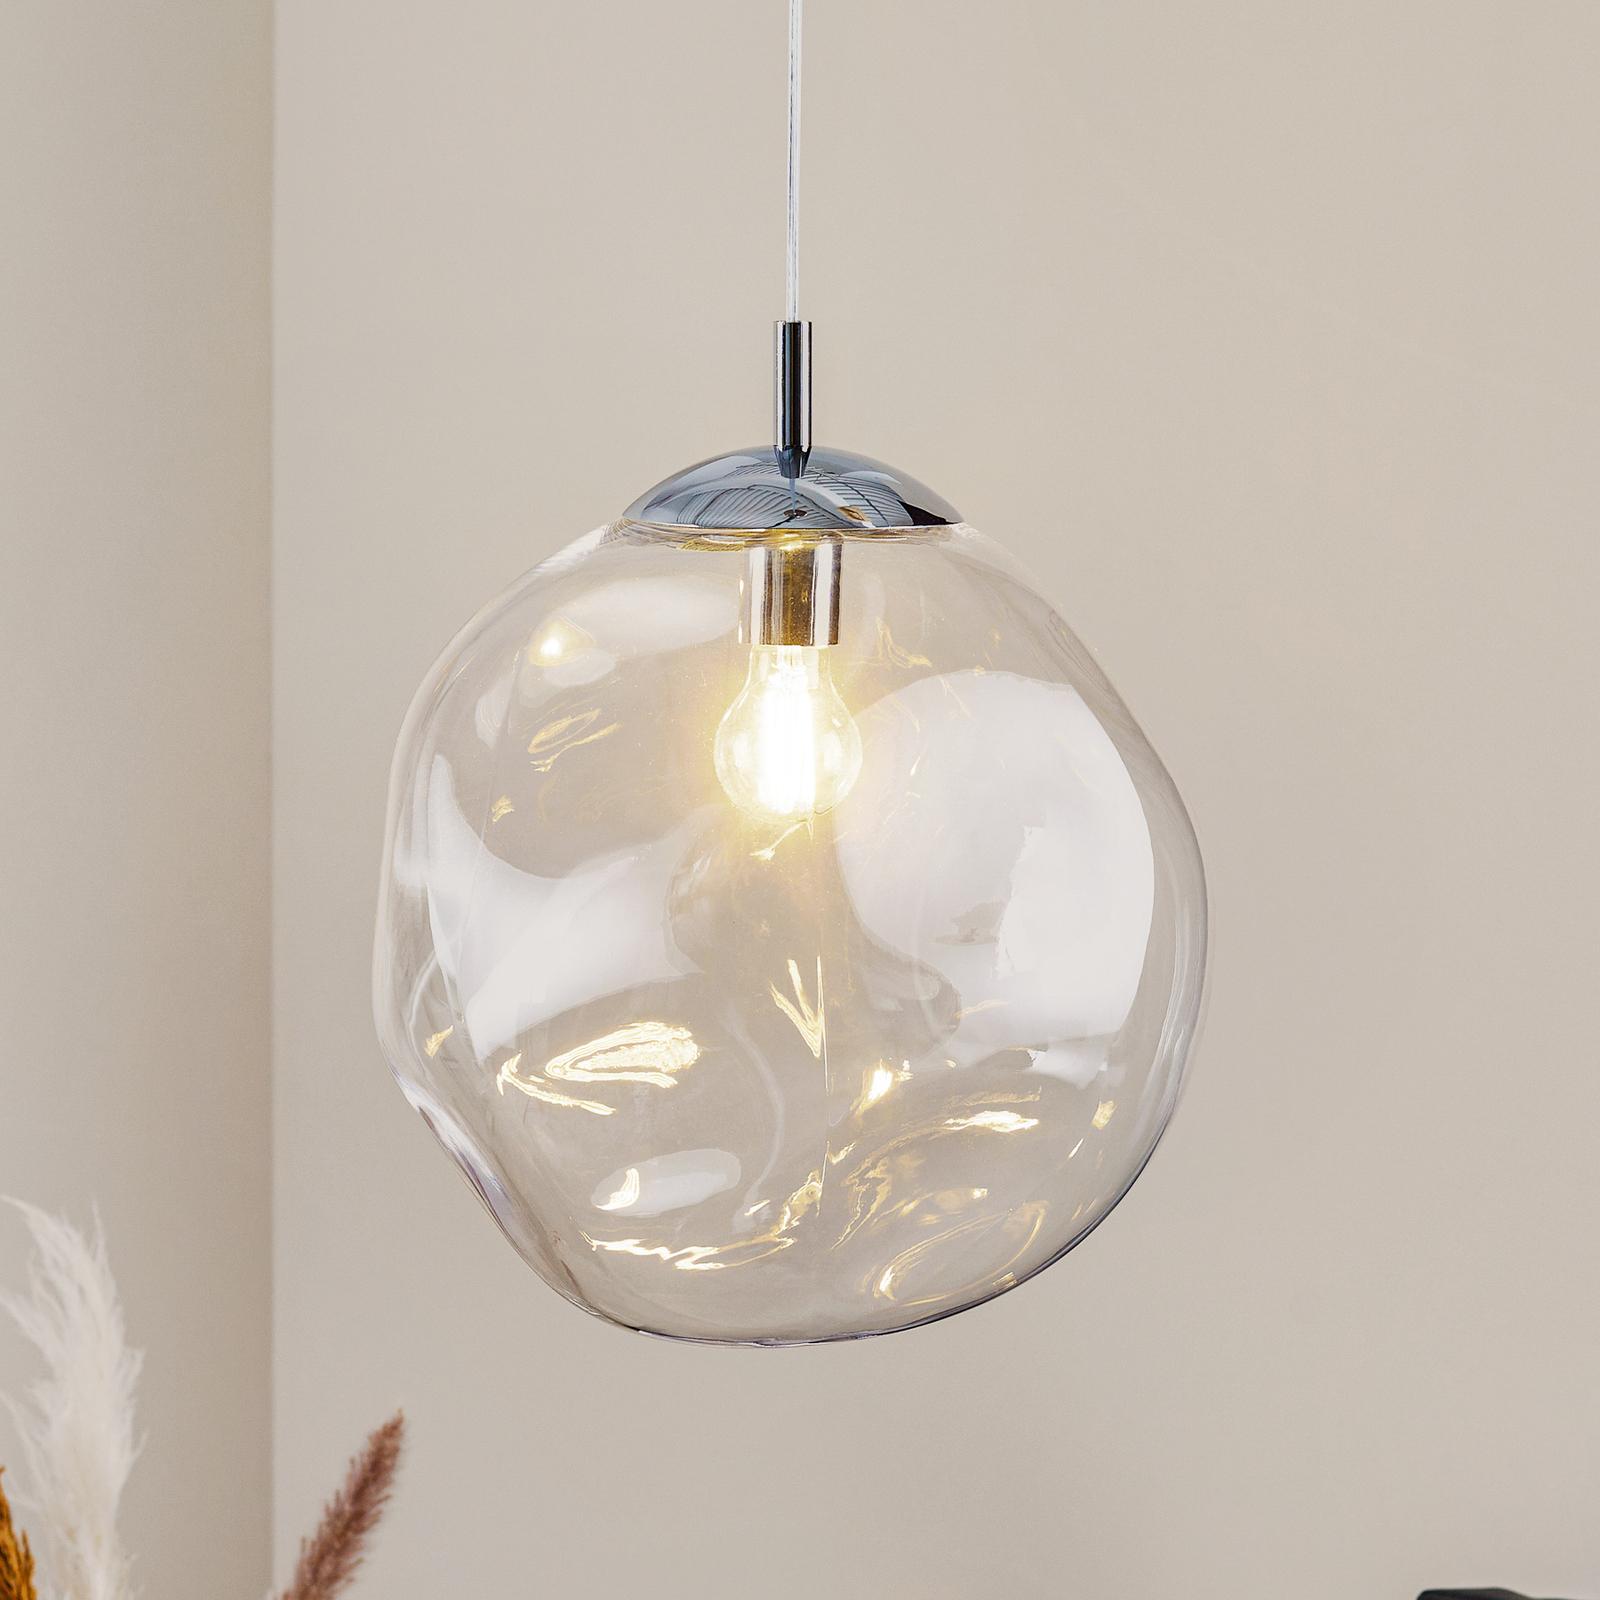 Lampada a sospensione vetro Sol, cromo/trasparente